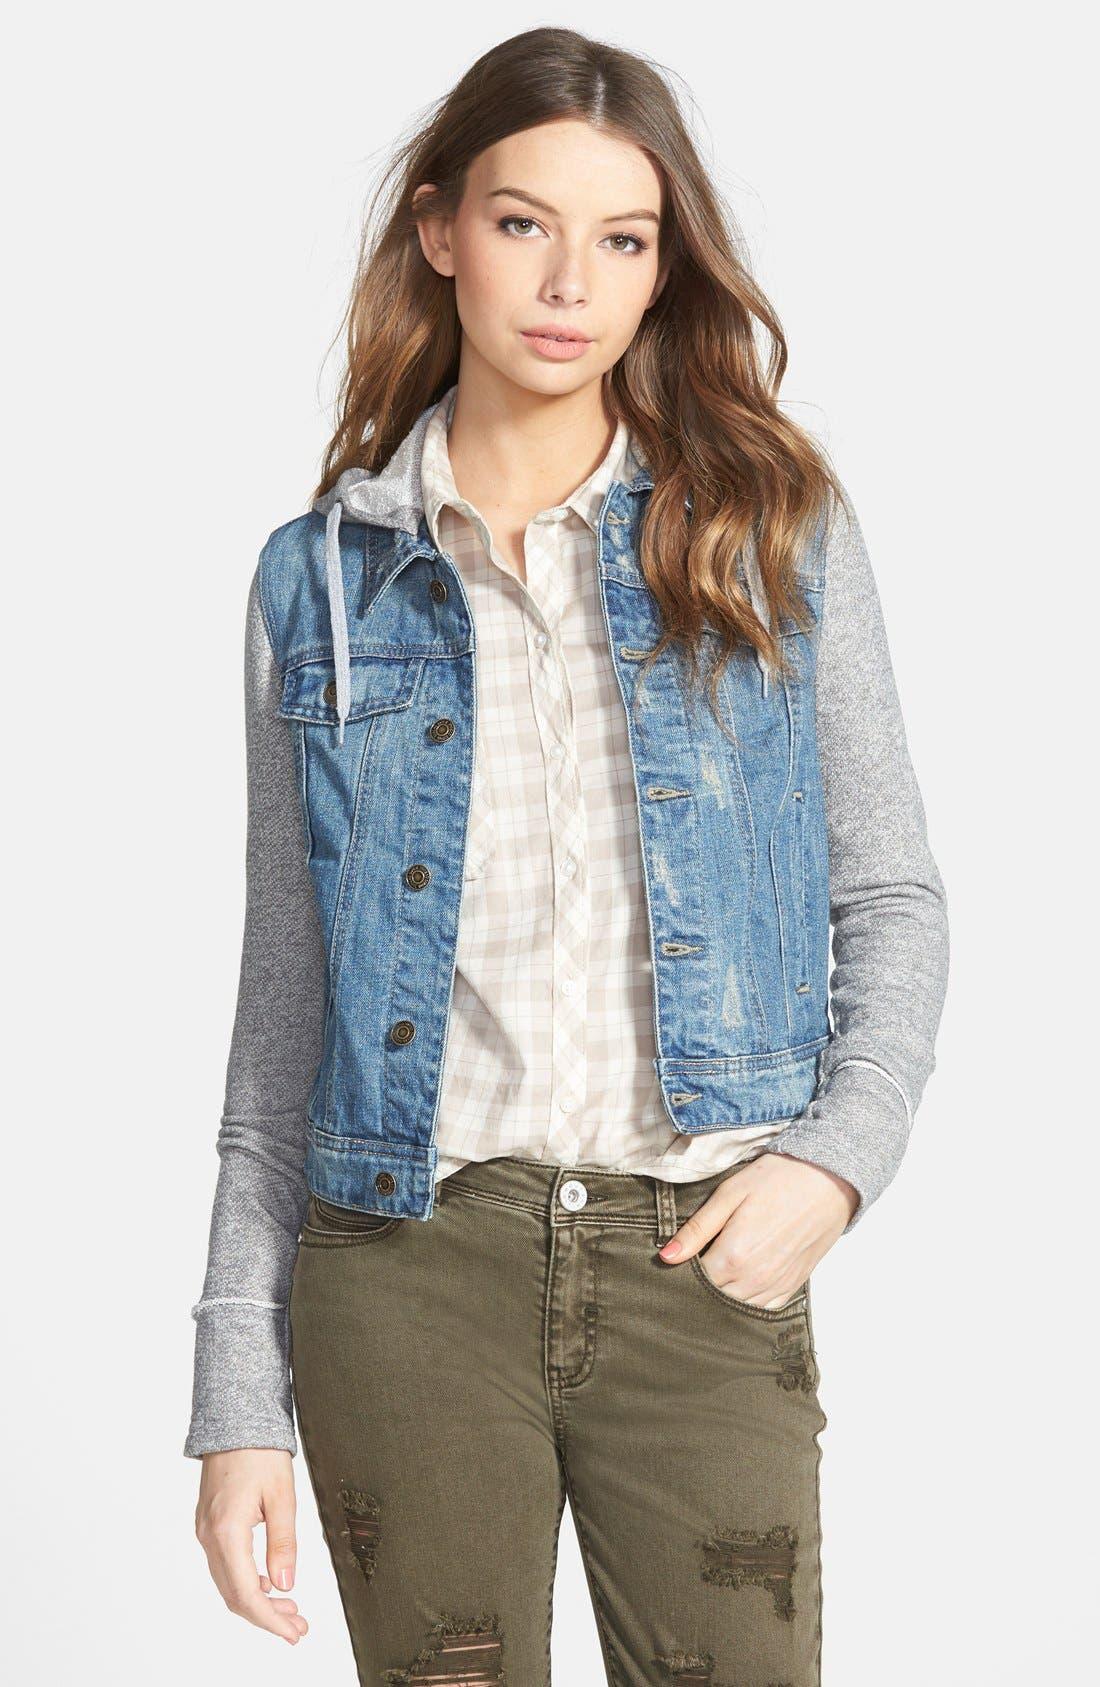 Alternate Image 1 Selected - Thread & Supply Hooded Denim Jacket with Fleece Sleeves (Juniors)